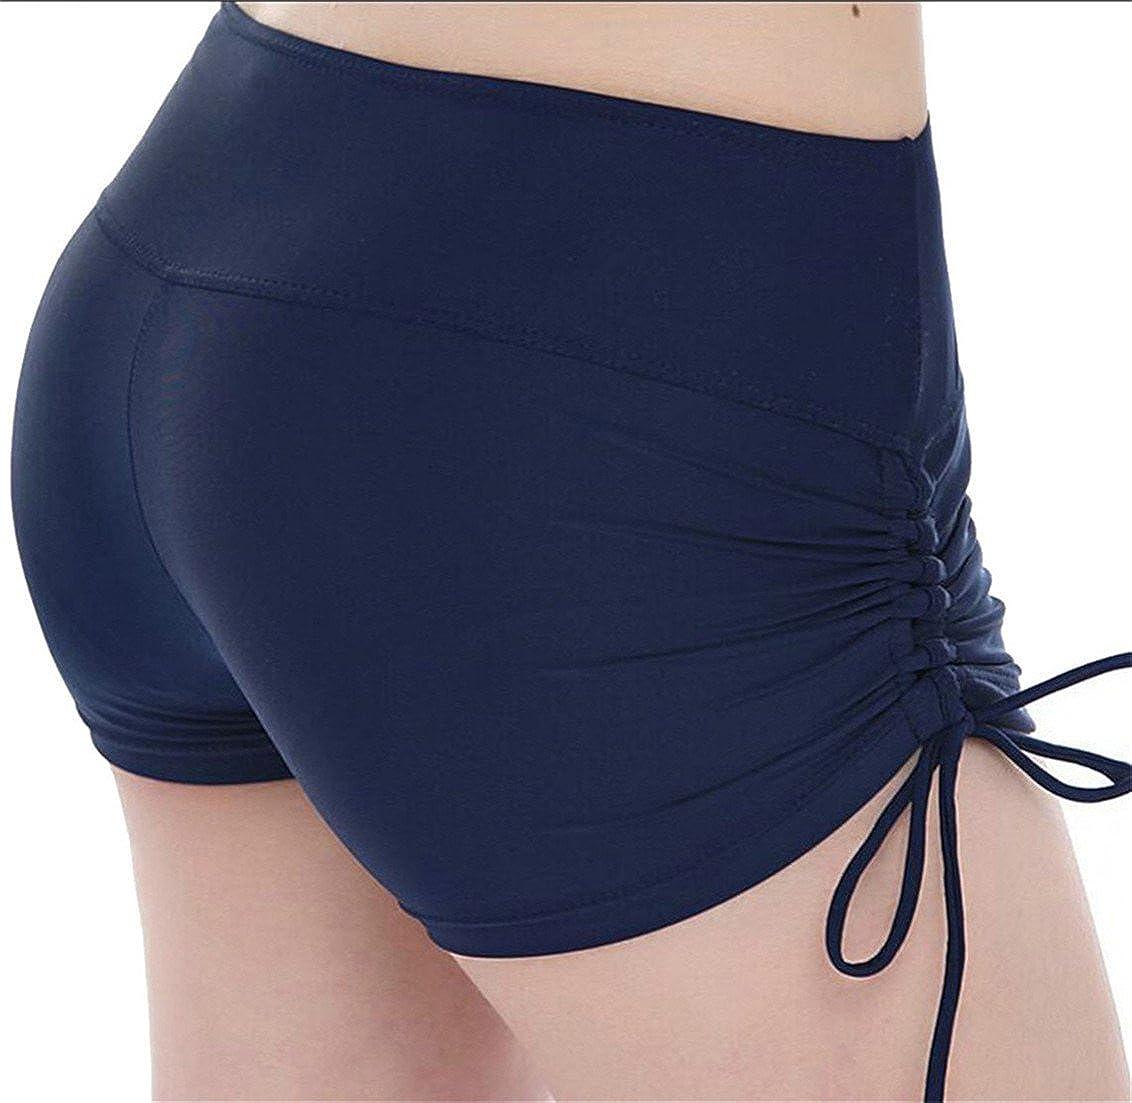 Fulok Womens Quick Dry Boardshorts Bathing Suits Swim Trunks Beach Shorts Navy Blue S